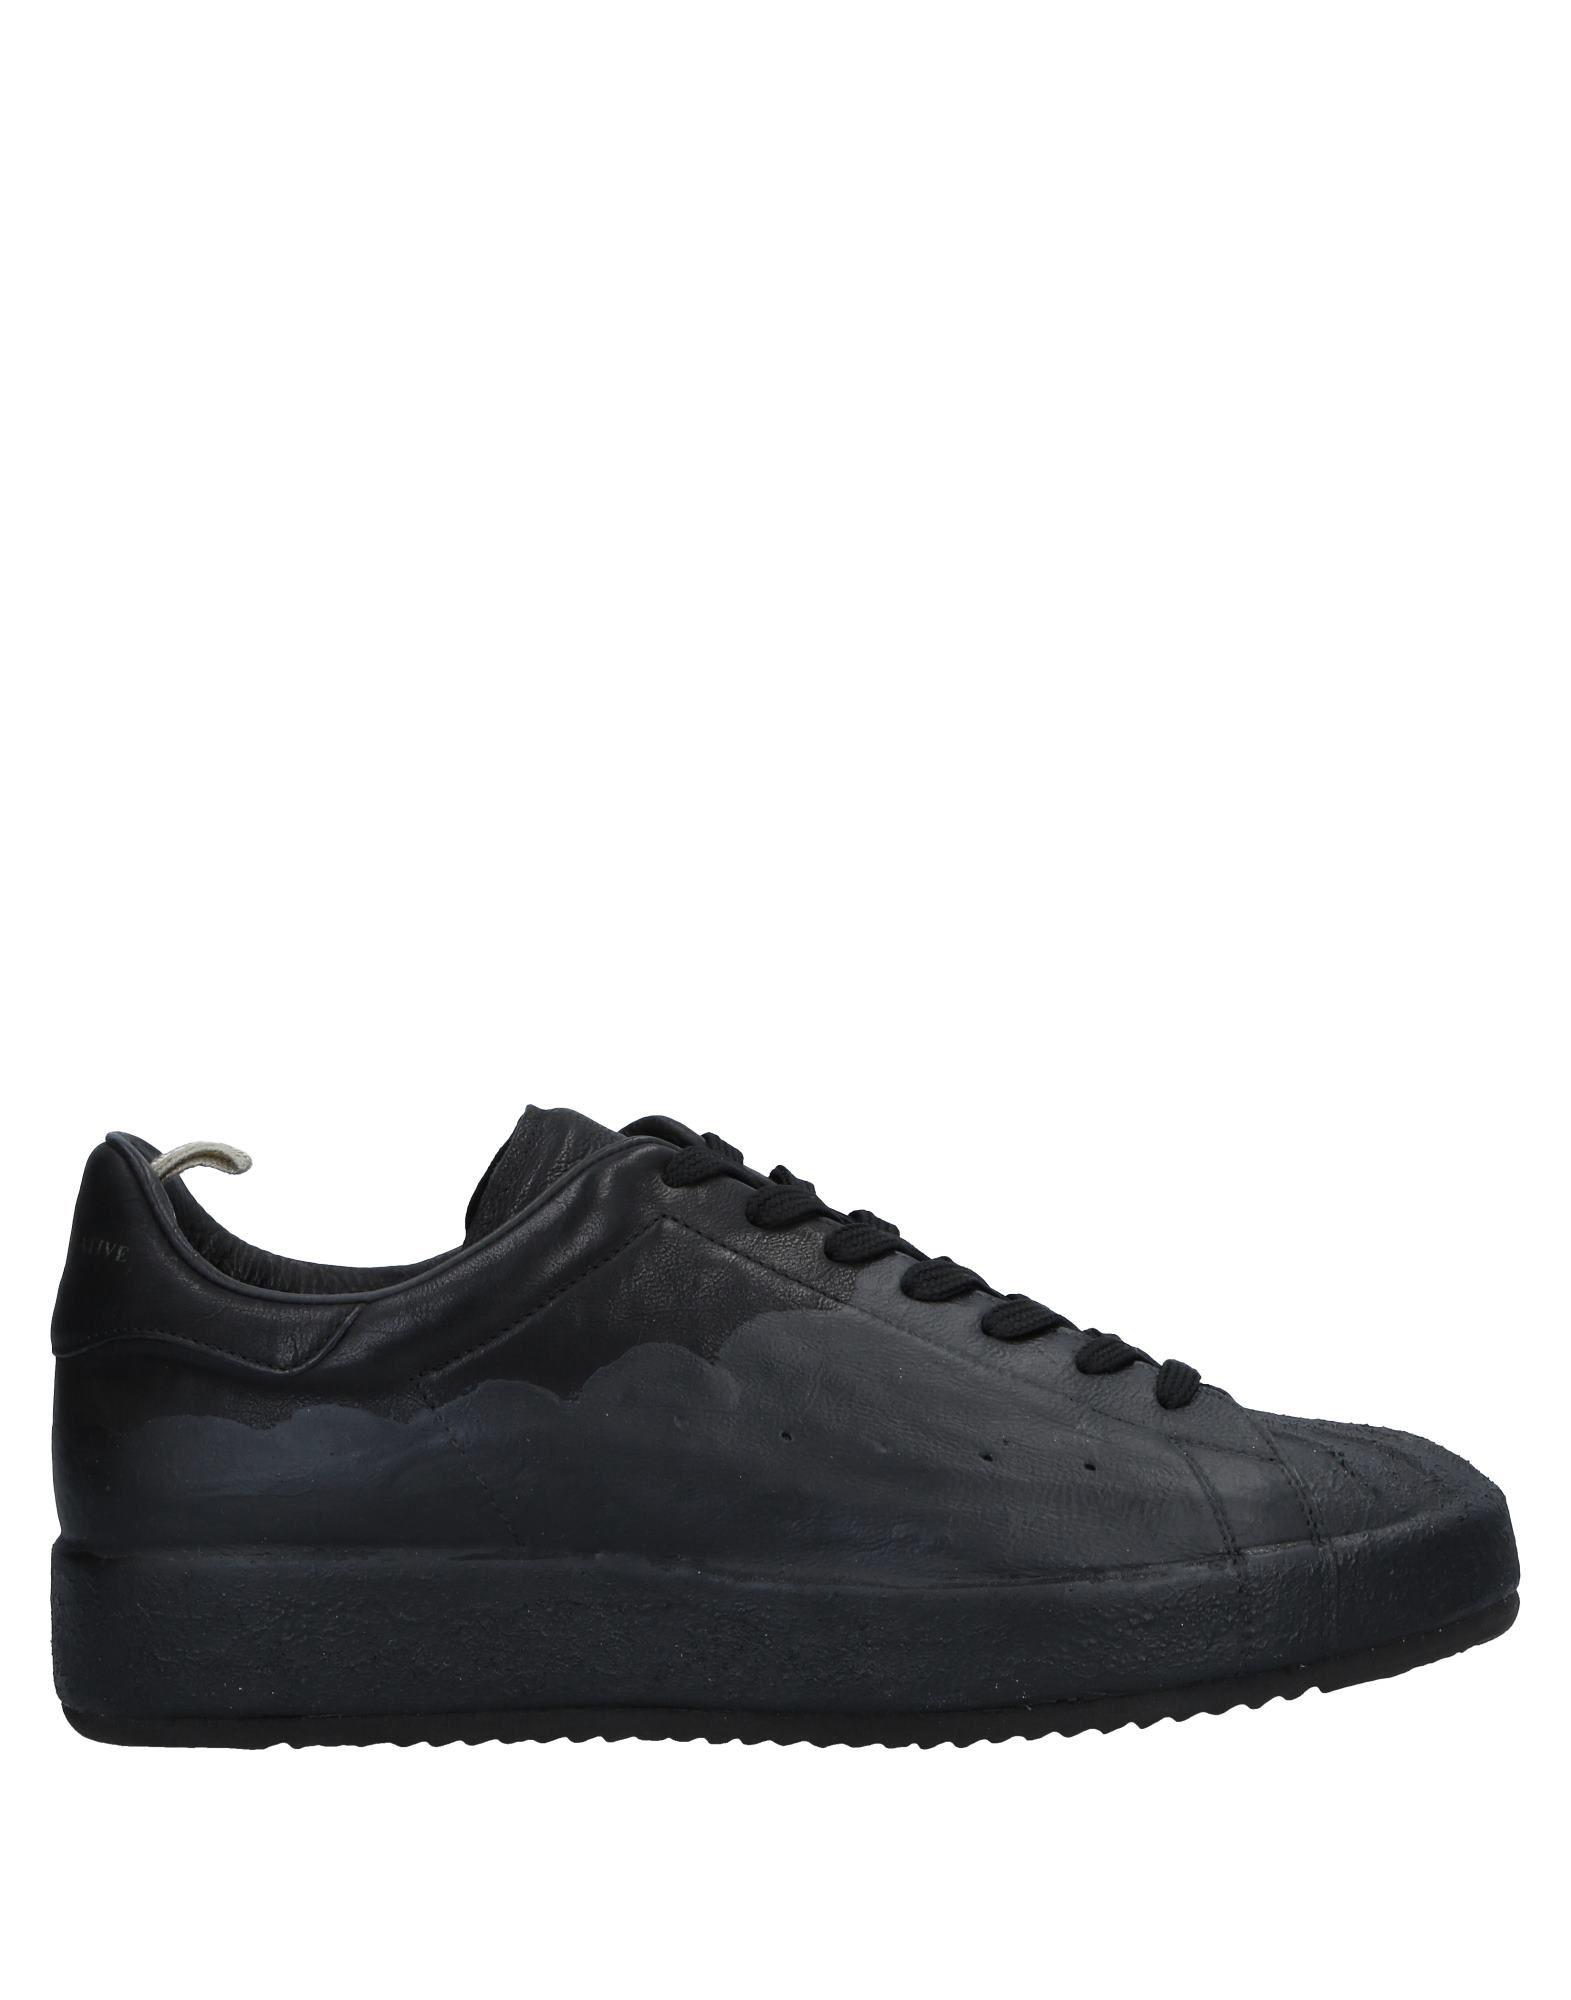 Sneakers Officine Creative Italia Uomo - 11525500AO